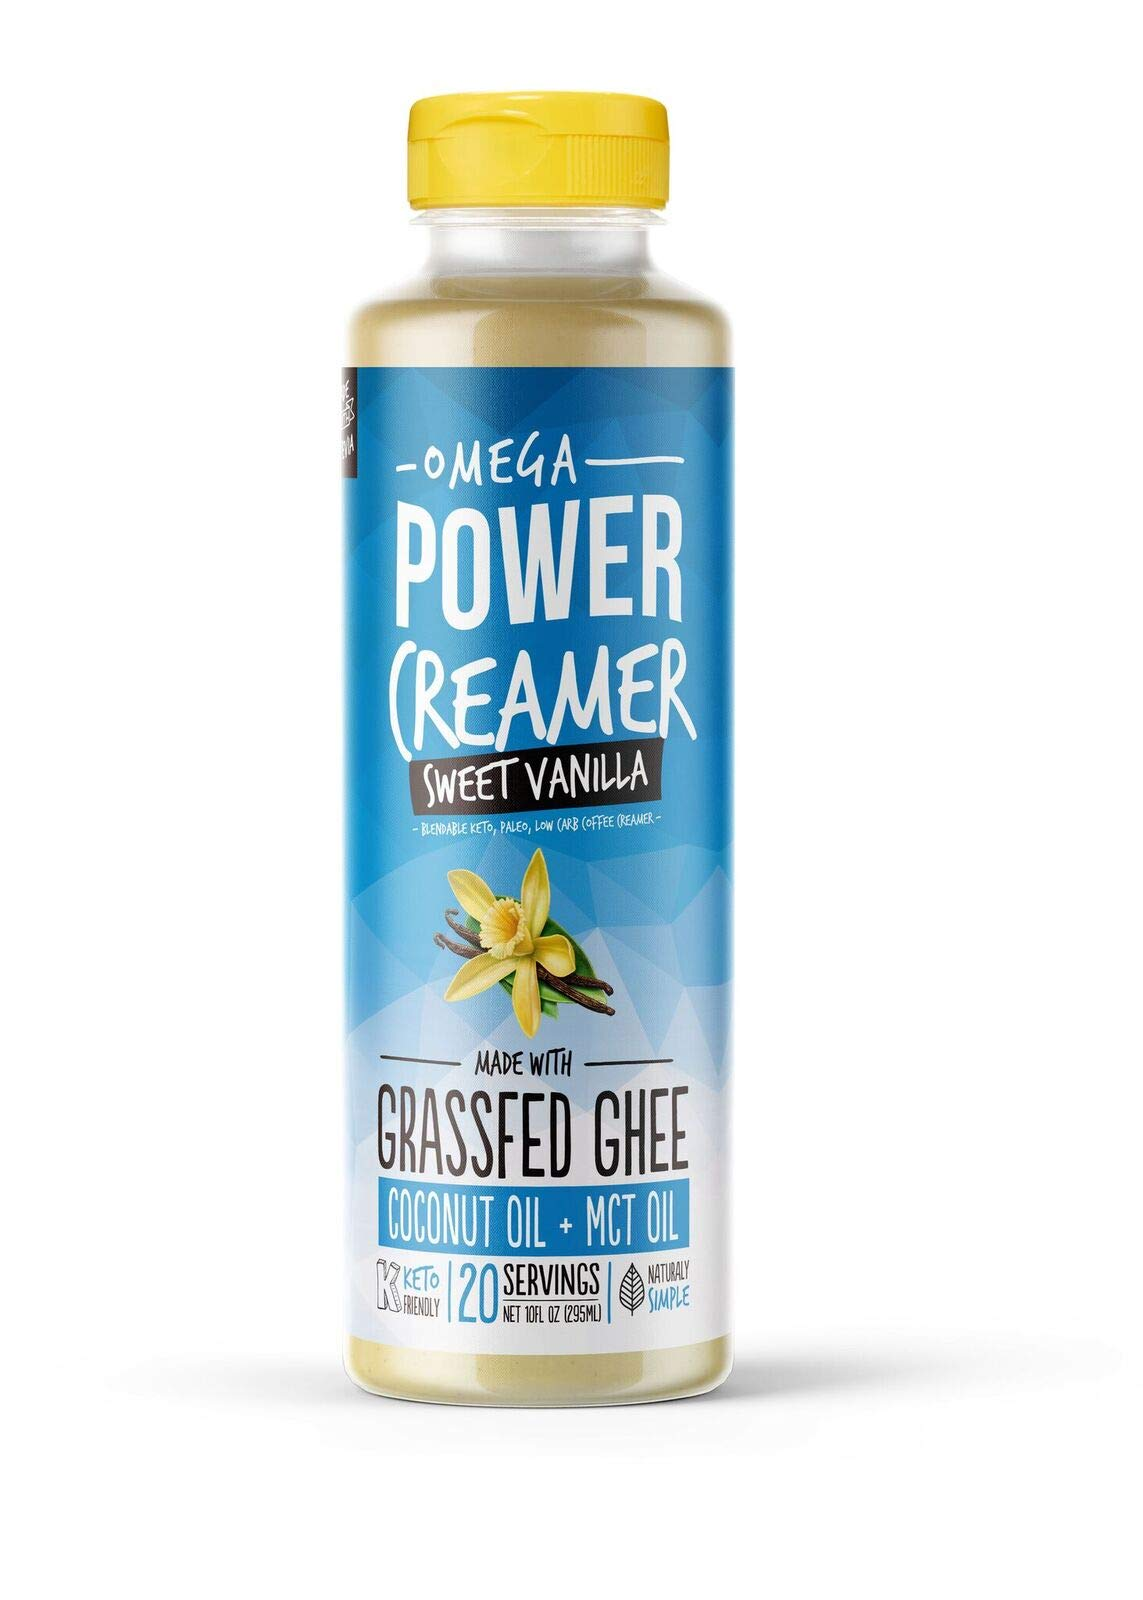 Omega PowerCreamer - VANILLA - Grass-fed Ghee, Organic Coconut Oil, MCT Oil, Natural Vanilla Flavoring, Stevia | Keto Coffee Creamer | Paleo, Low Carb, Sugar Free, Butter Coffee 10 fl oz (20 servings)